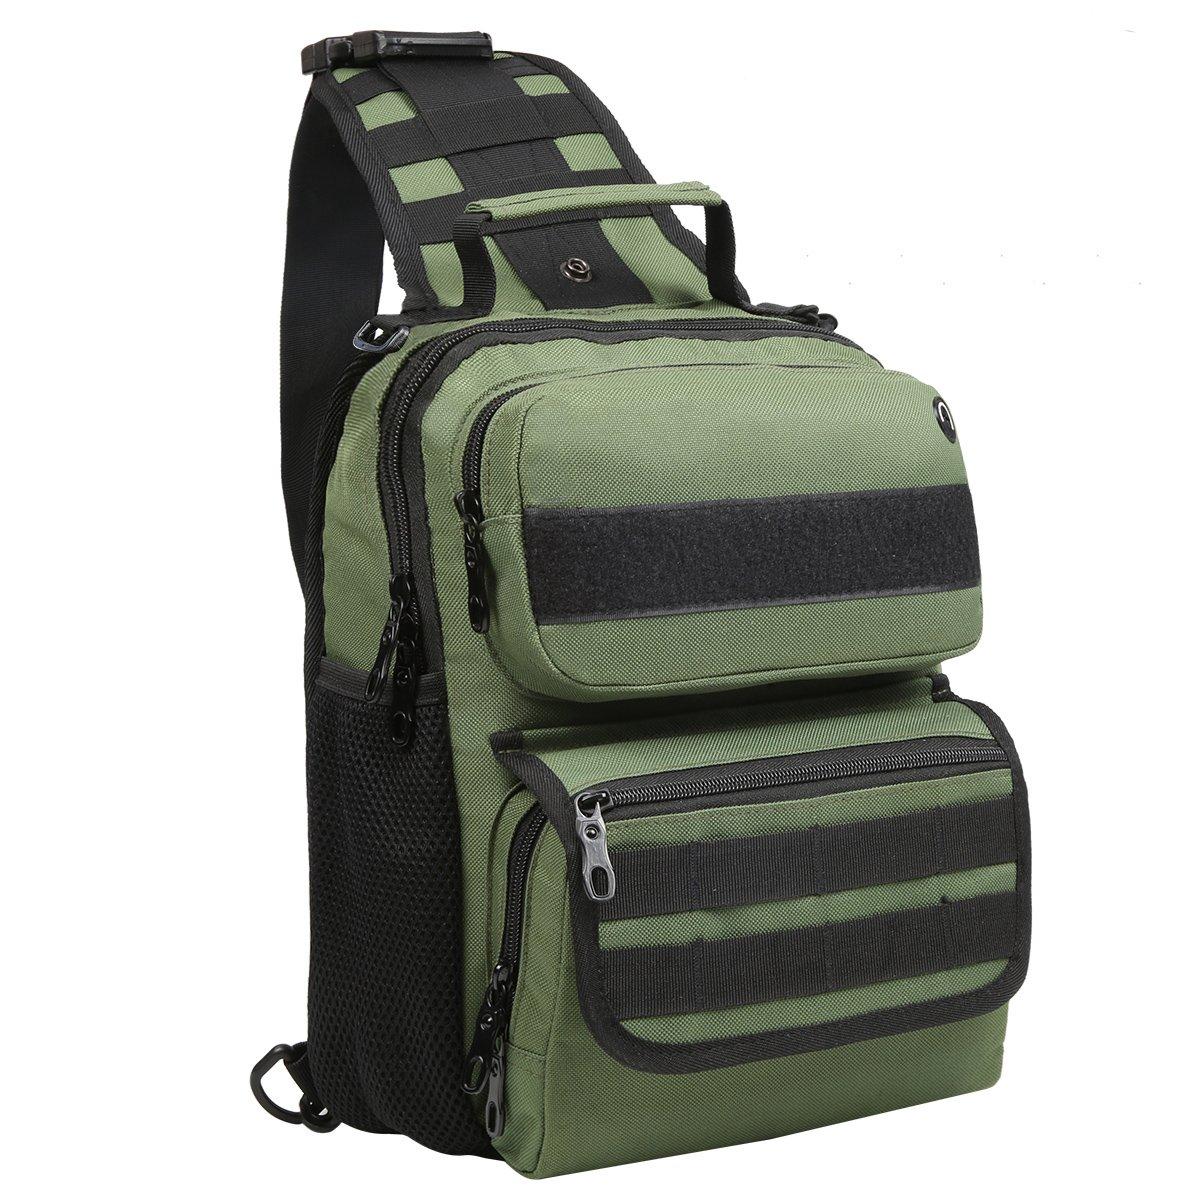 Bekahizar Tactical Sling Bag Military Shoulder Pack Outdoor Molle Chest Backpack